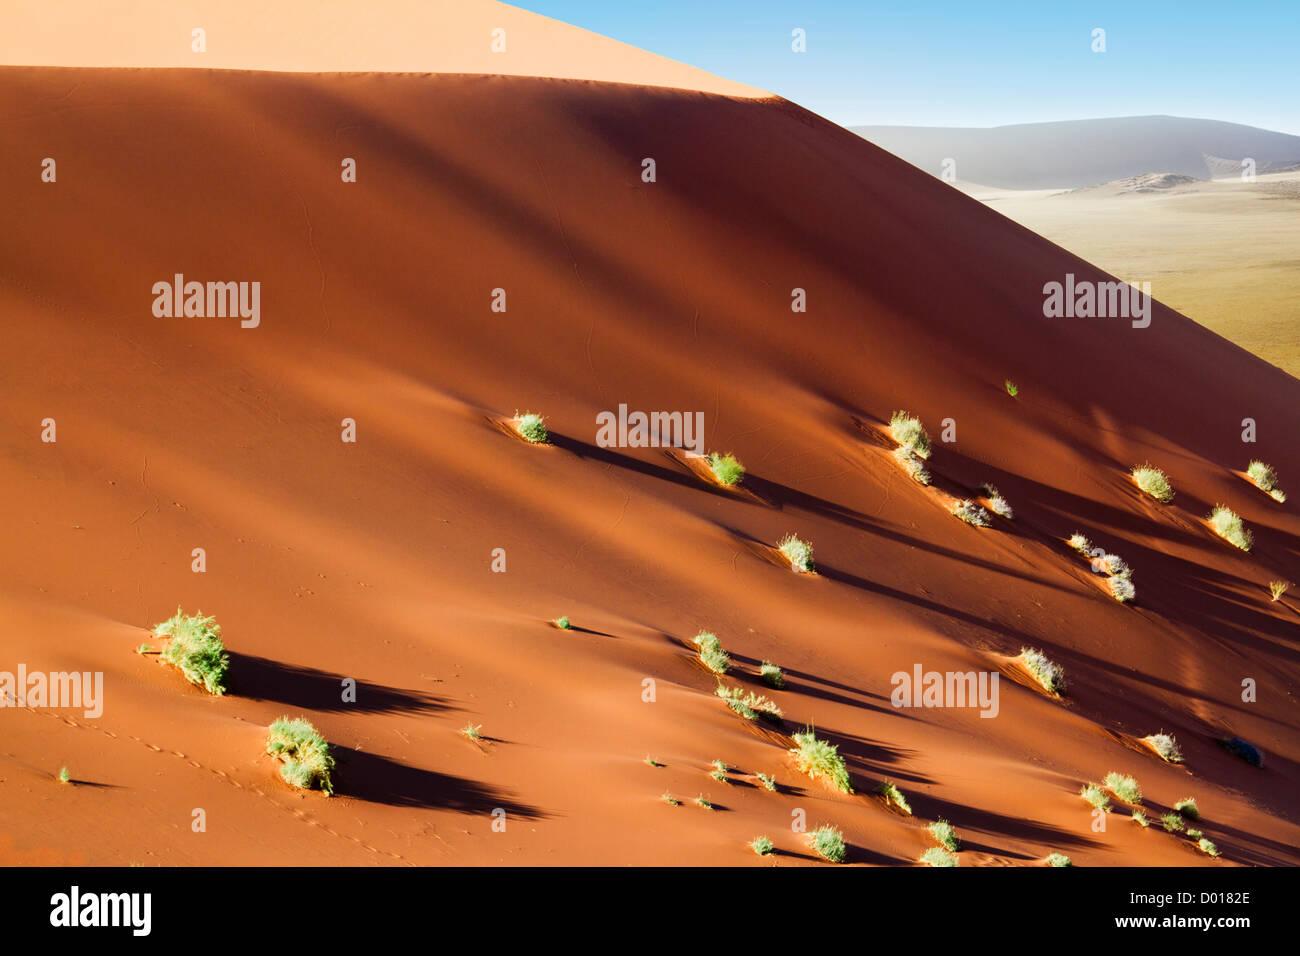 Wandering dune of Sossuvlei in Namibia - Stock Image